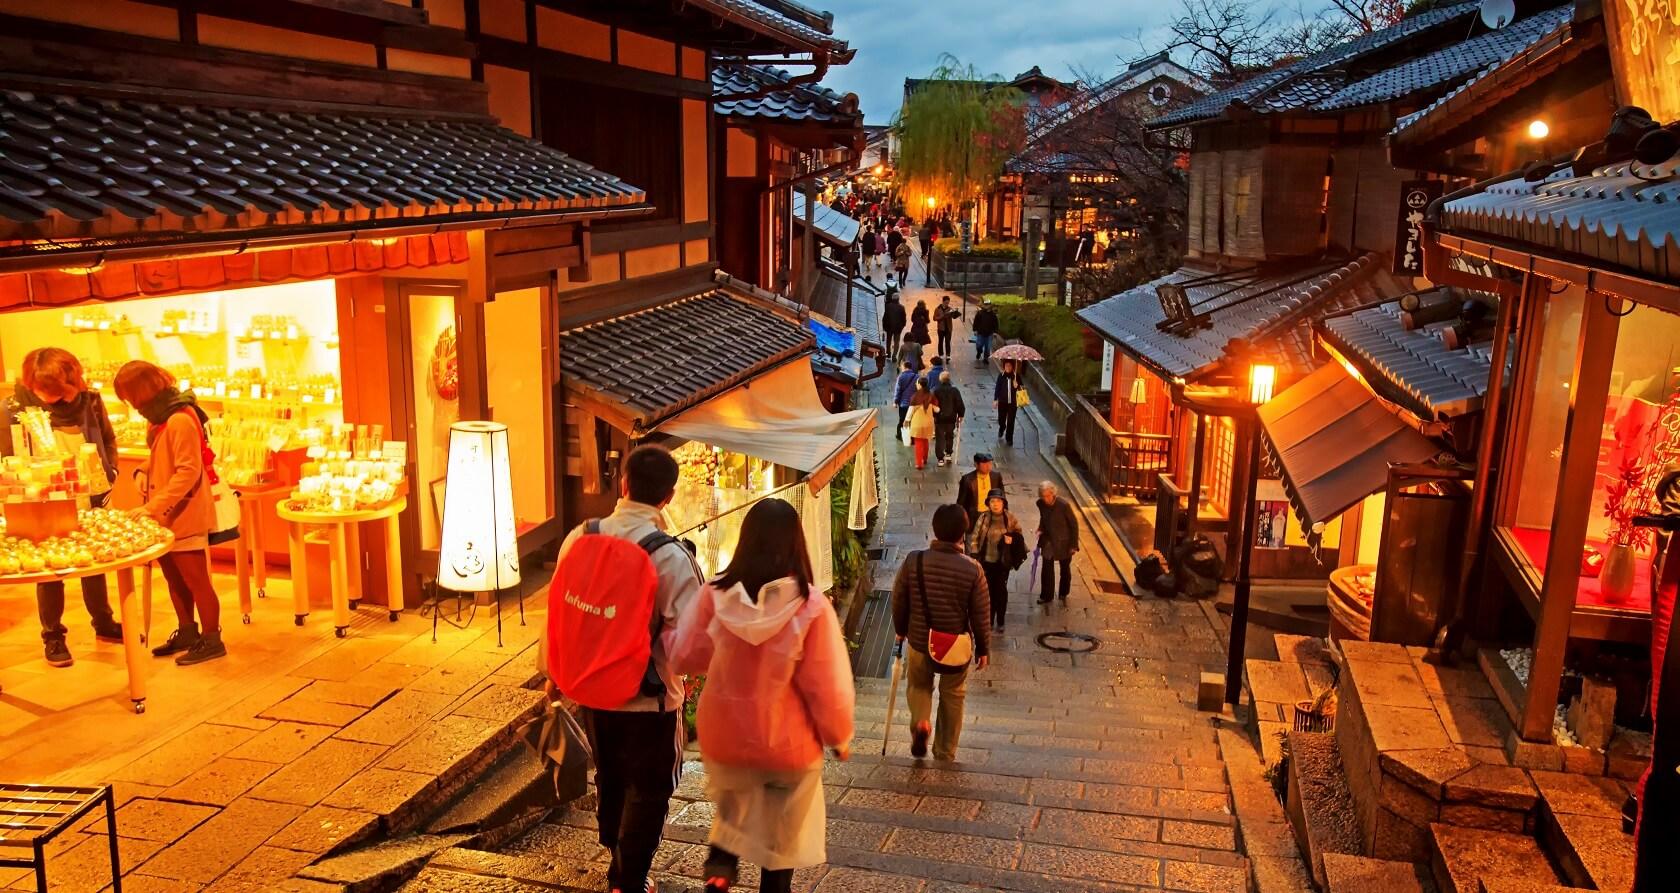 Ninenzaka street in Kyoto